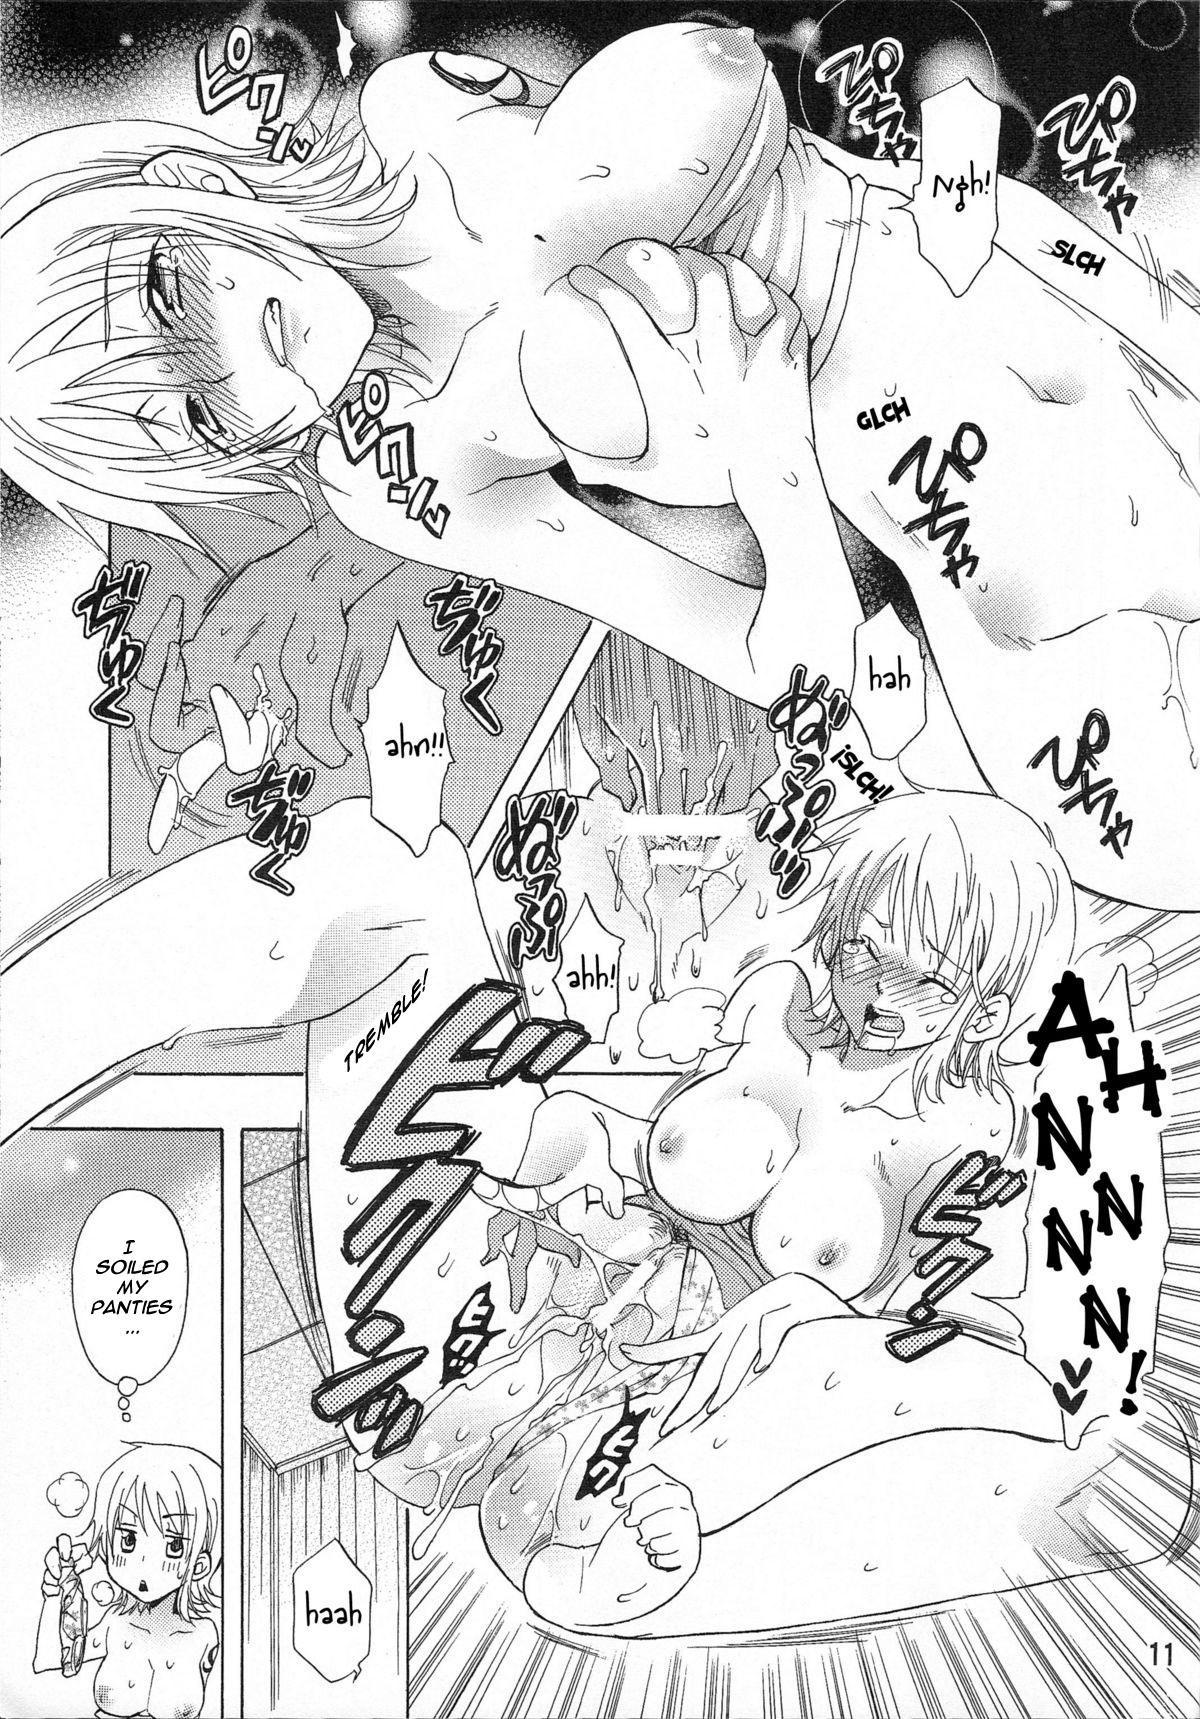 (C75) [Kurione-sha (YU-RI)] Nami-chan to A SO BO | Let's Play with Nami-chan! (One Piece) [English] [haai1717] 10